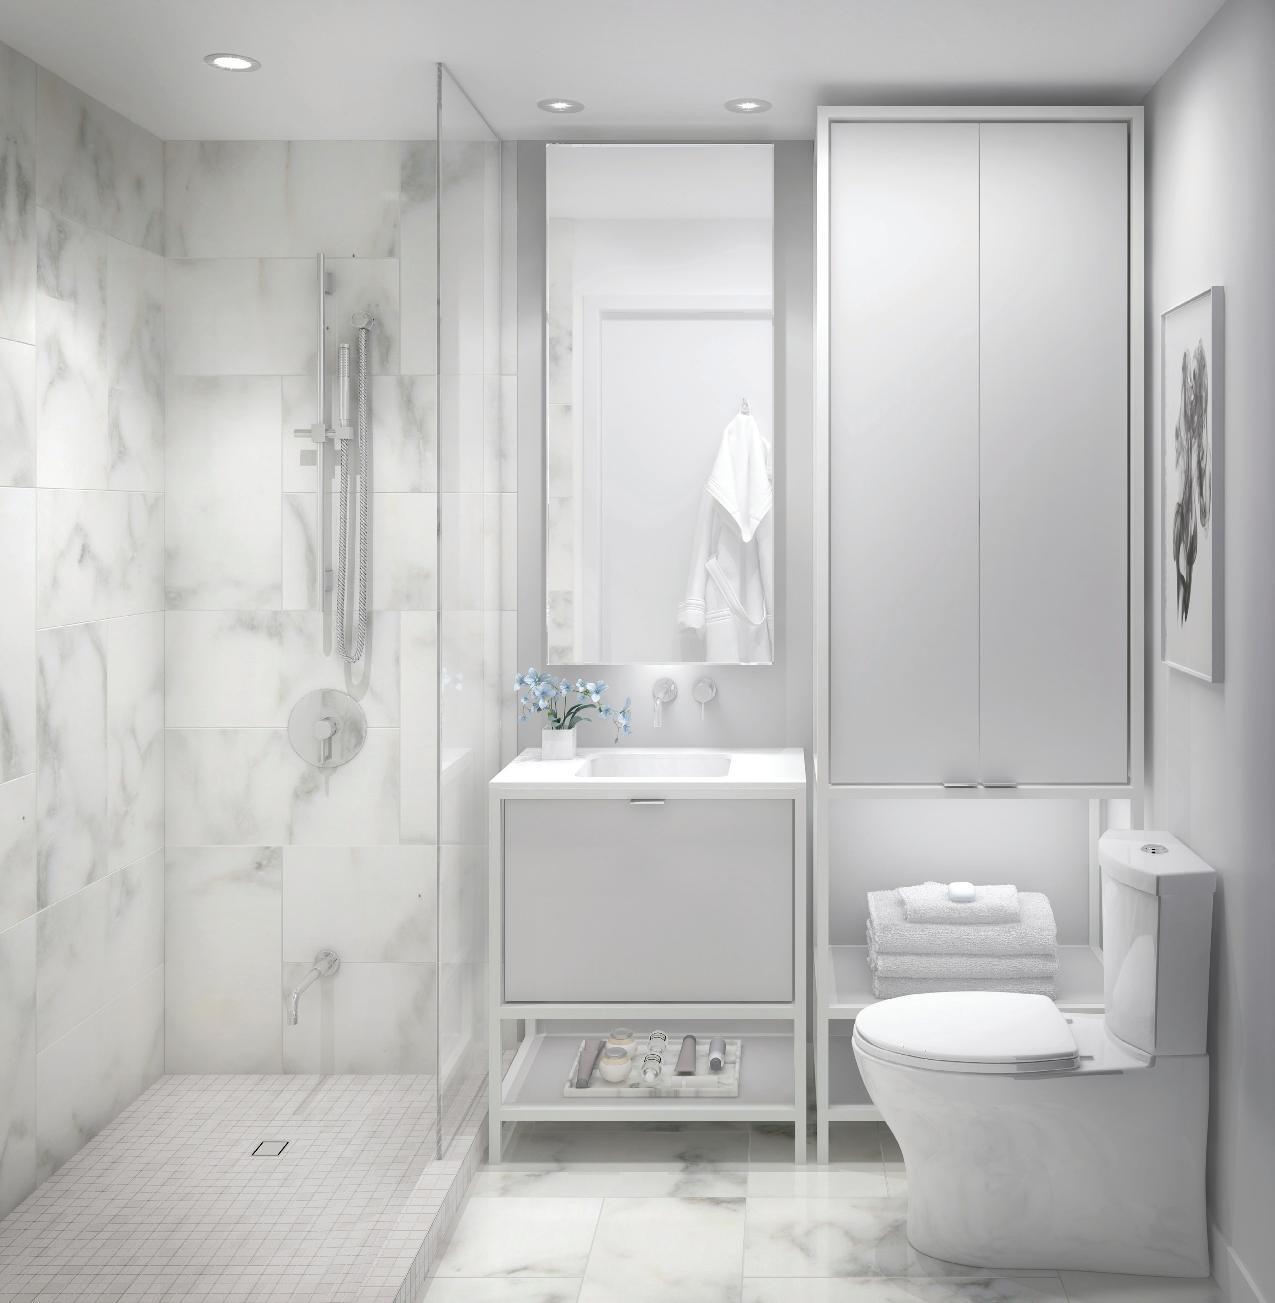 88-north-condos-ernestina-birova-interior_powderroom